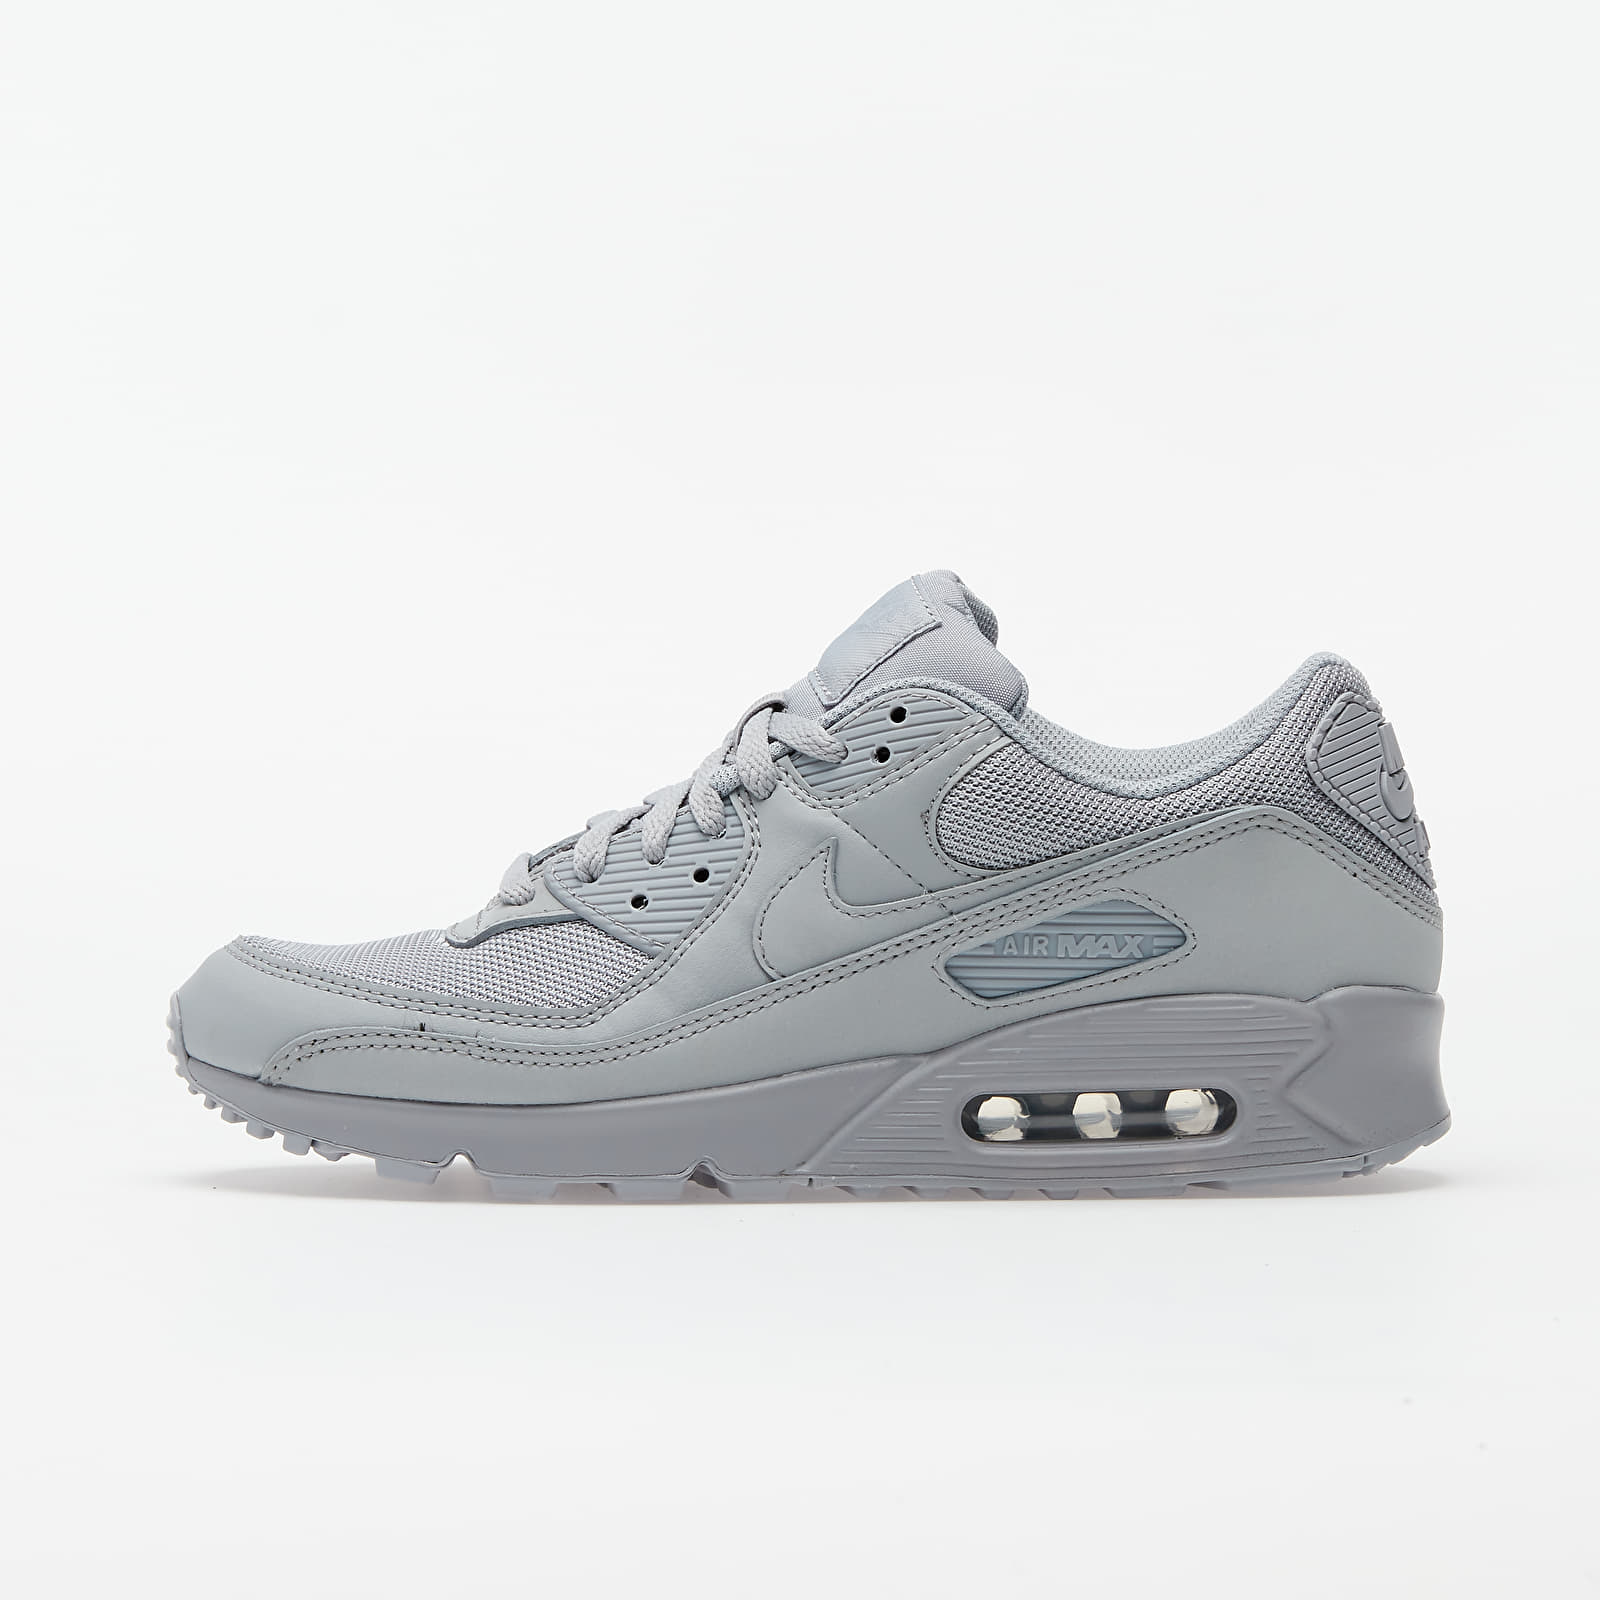 Pánské tenisky a boty Nike Air Max 90 Wolf Grey/ Wolf Grey-Wolf Grey-Black